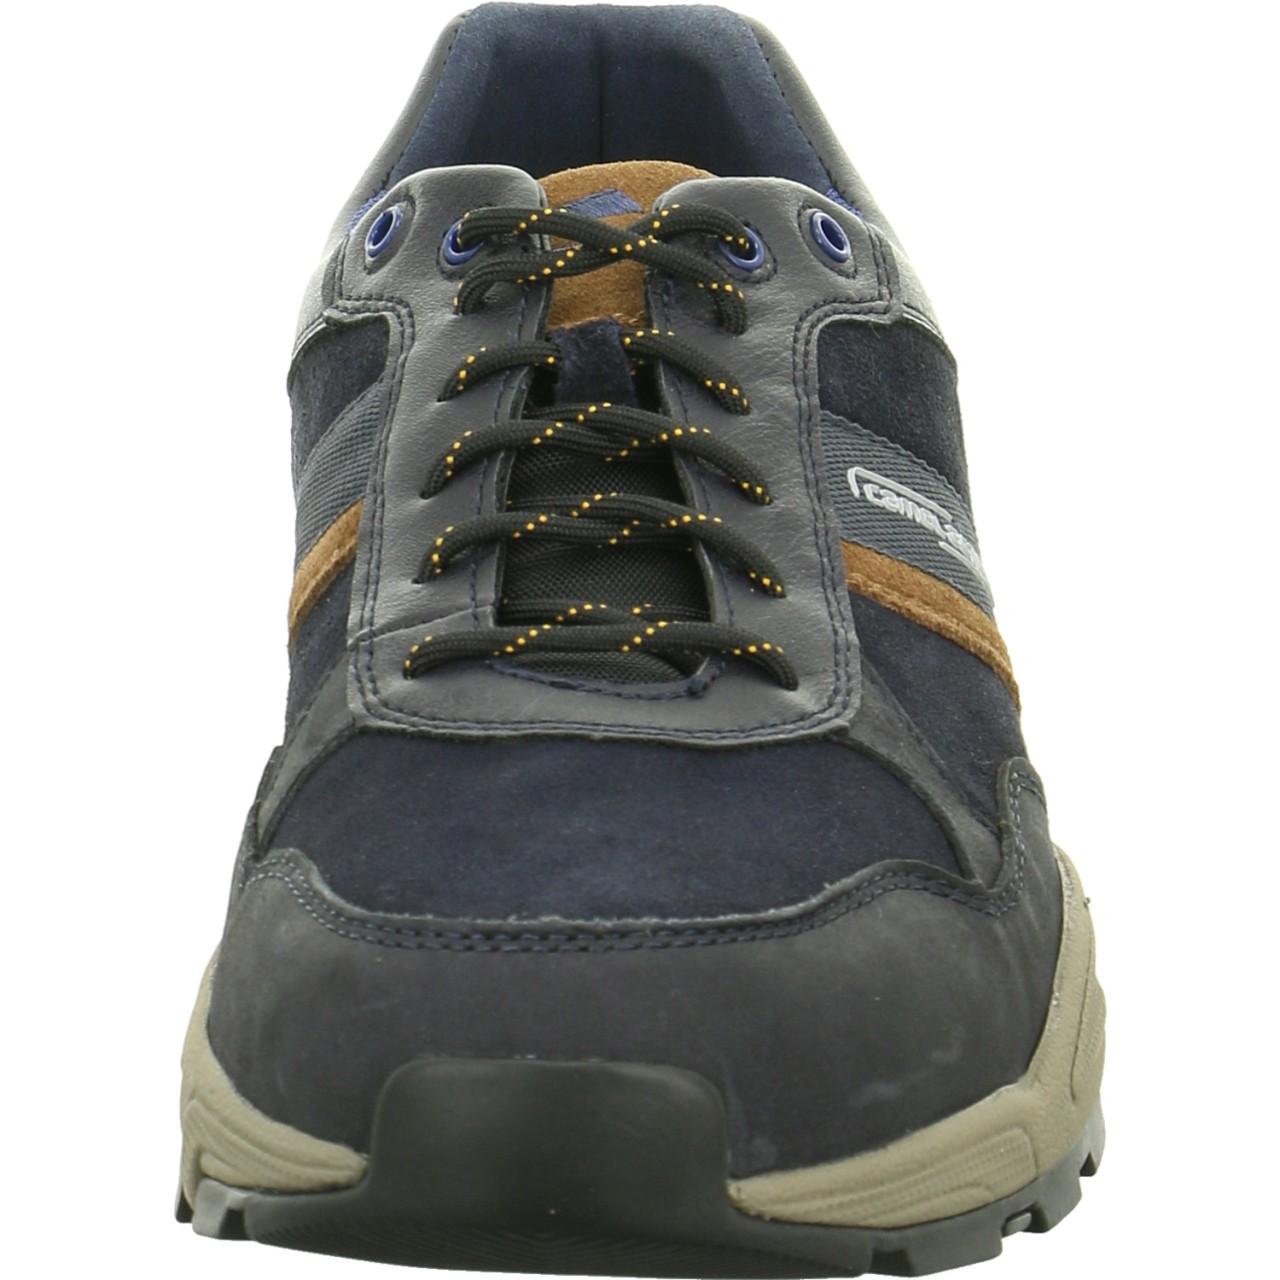 Camel Active Sneaker Männer 13830-02